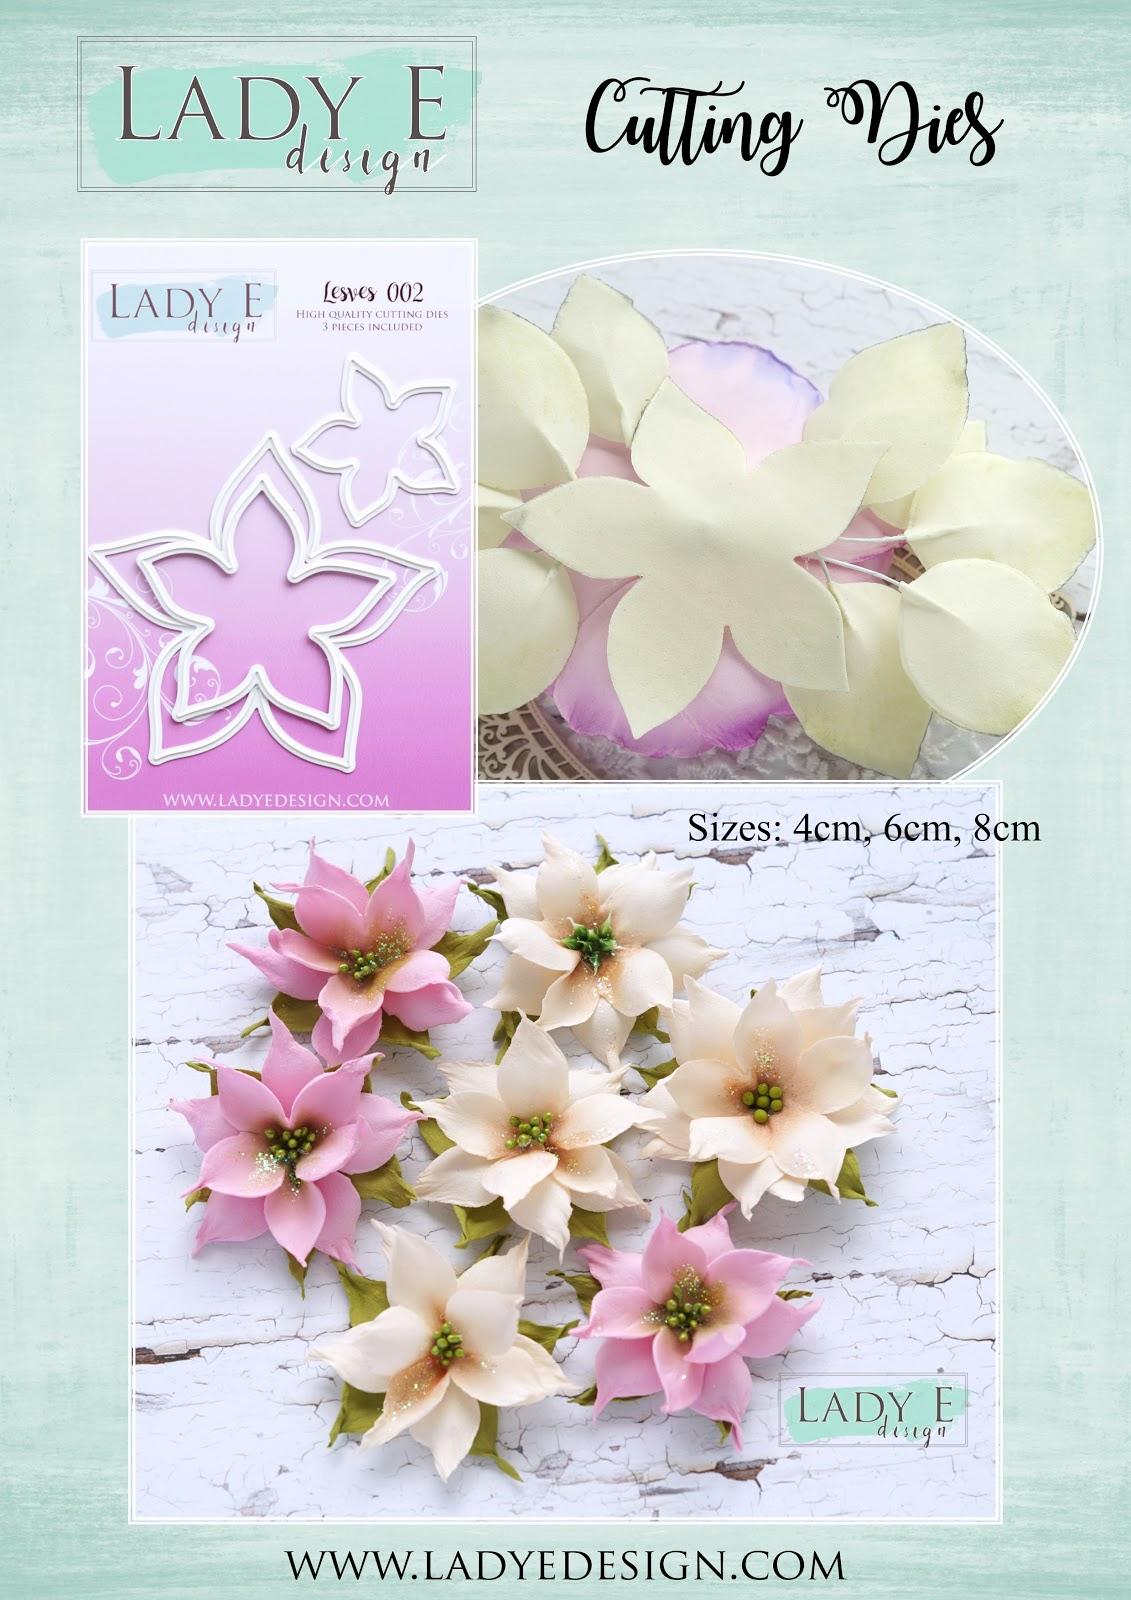 100pcs Laser Cut Satin Drill Snowflake Embellishments for Wedding 40mm Pink